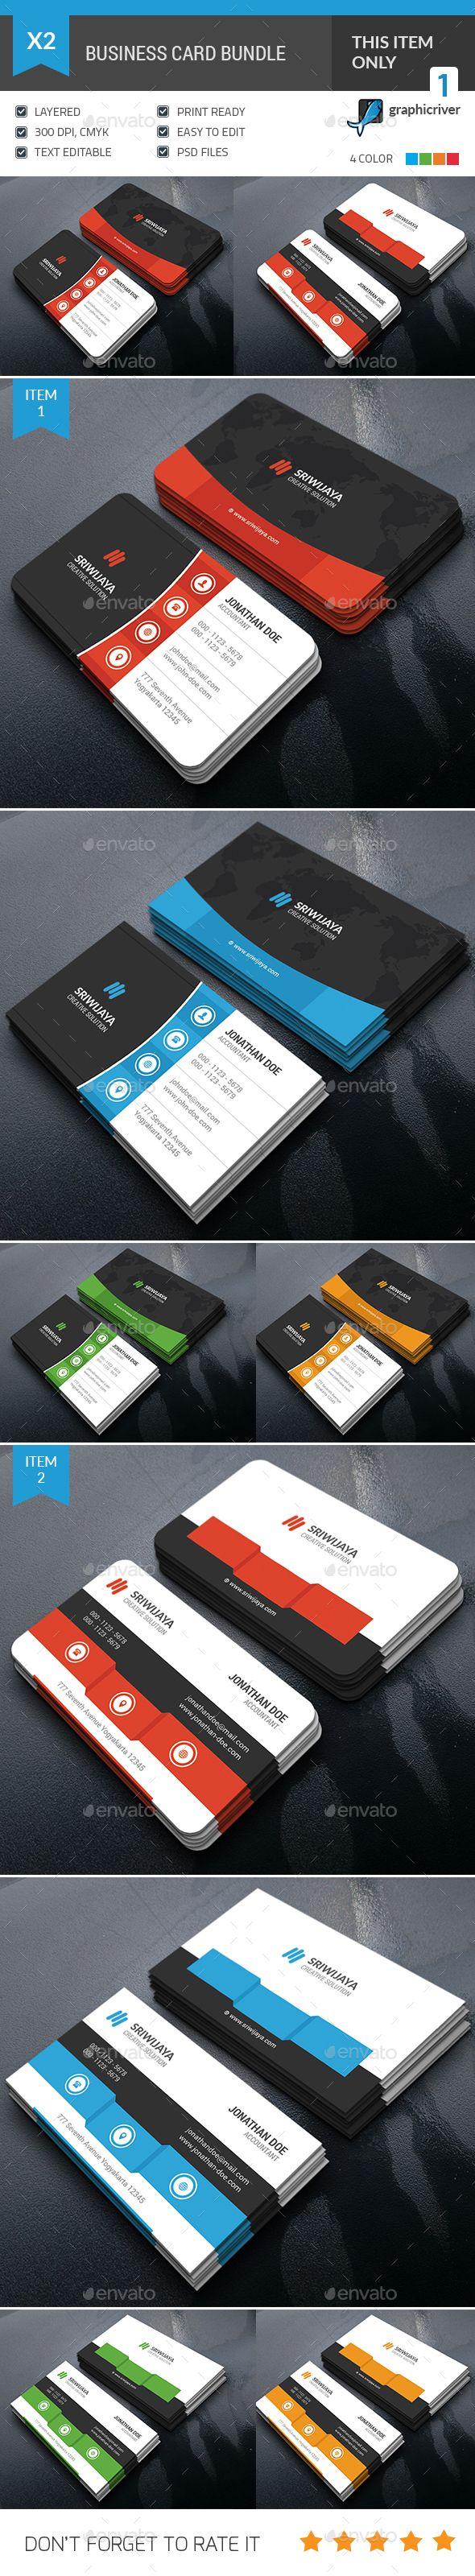 Business Card Bundle Template PSD design Download